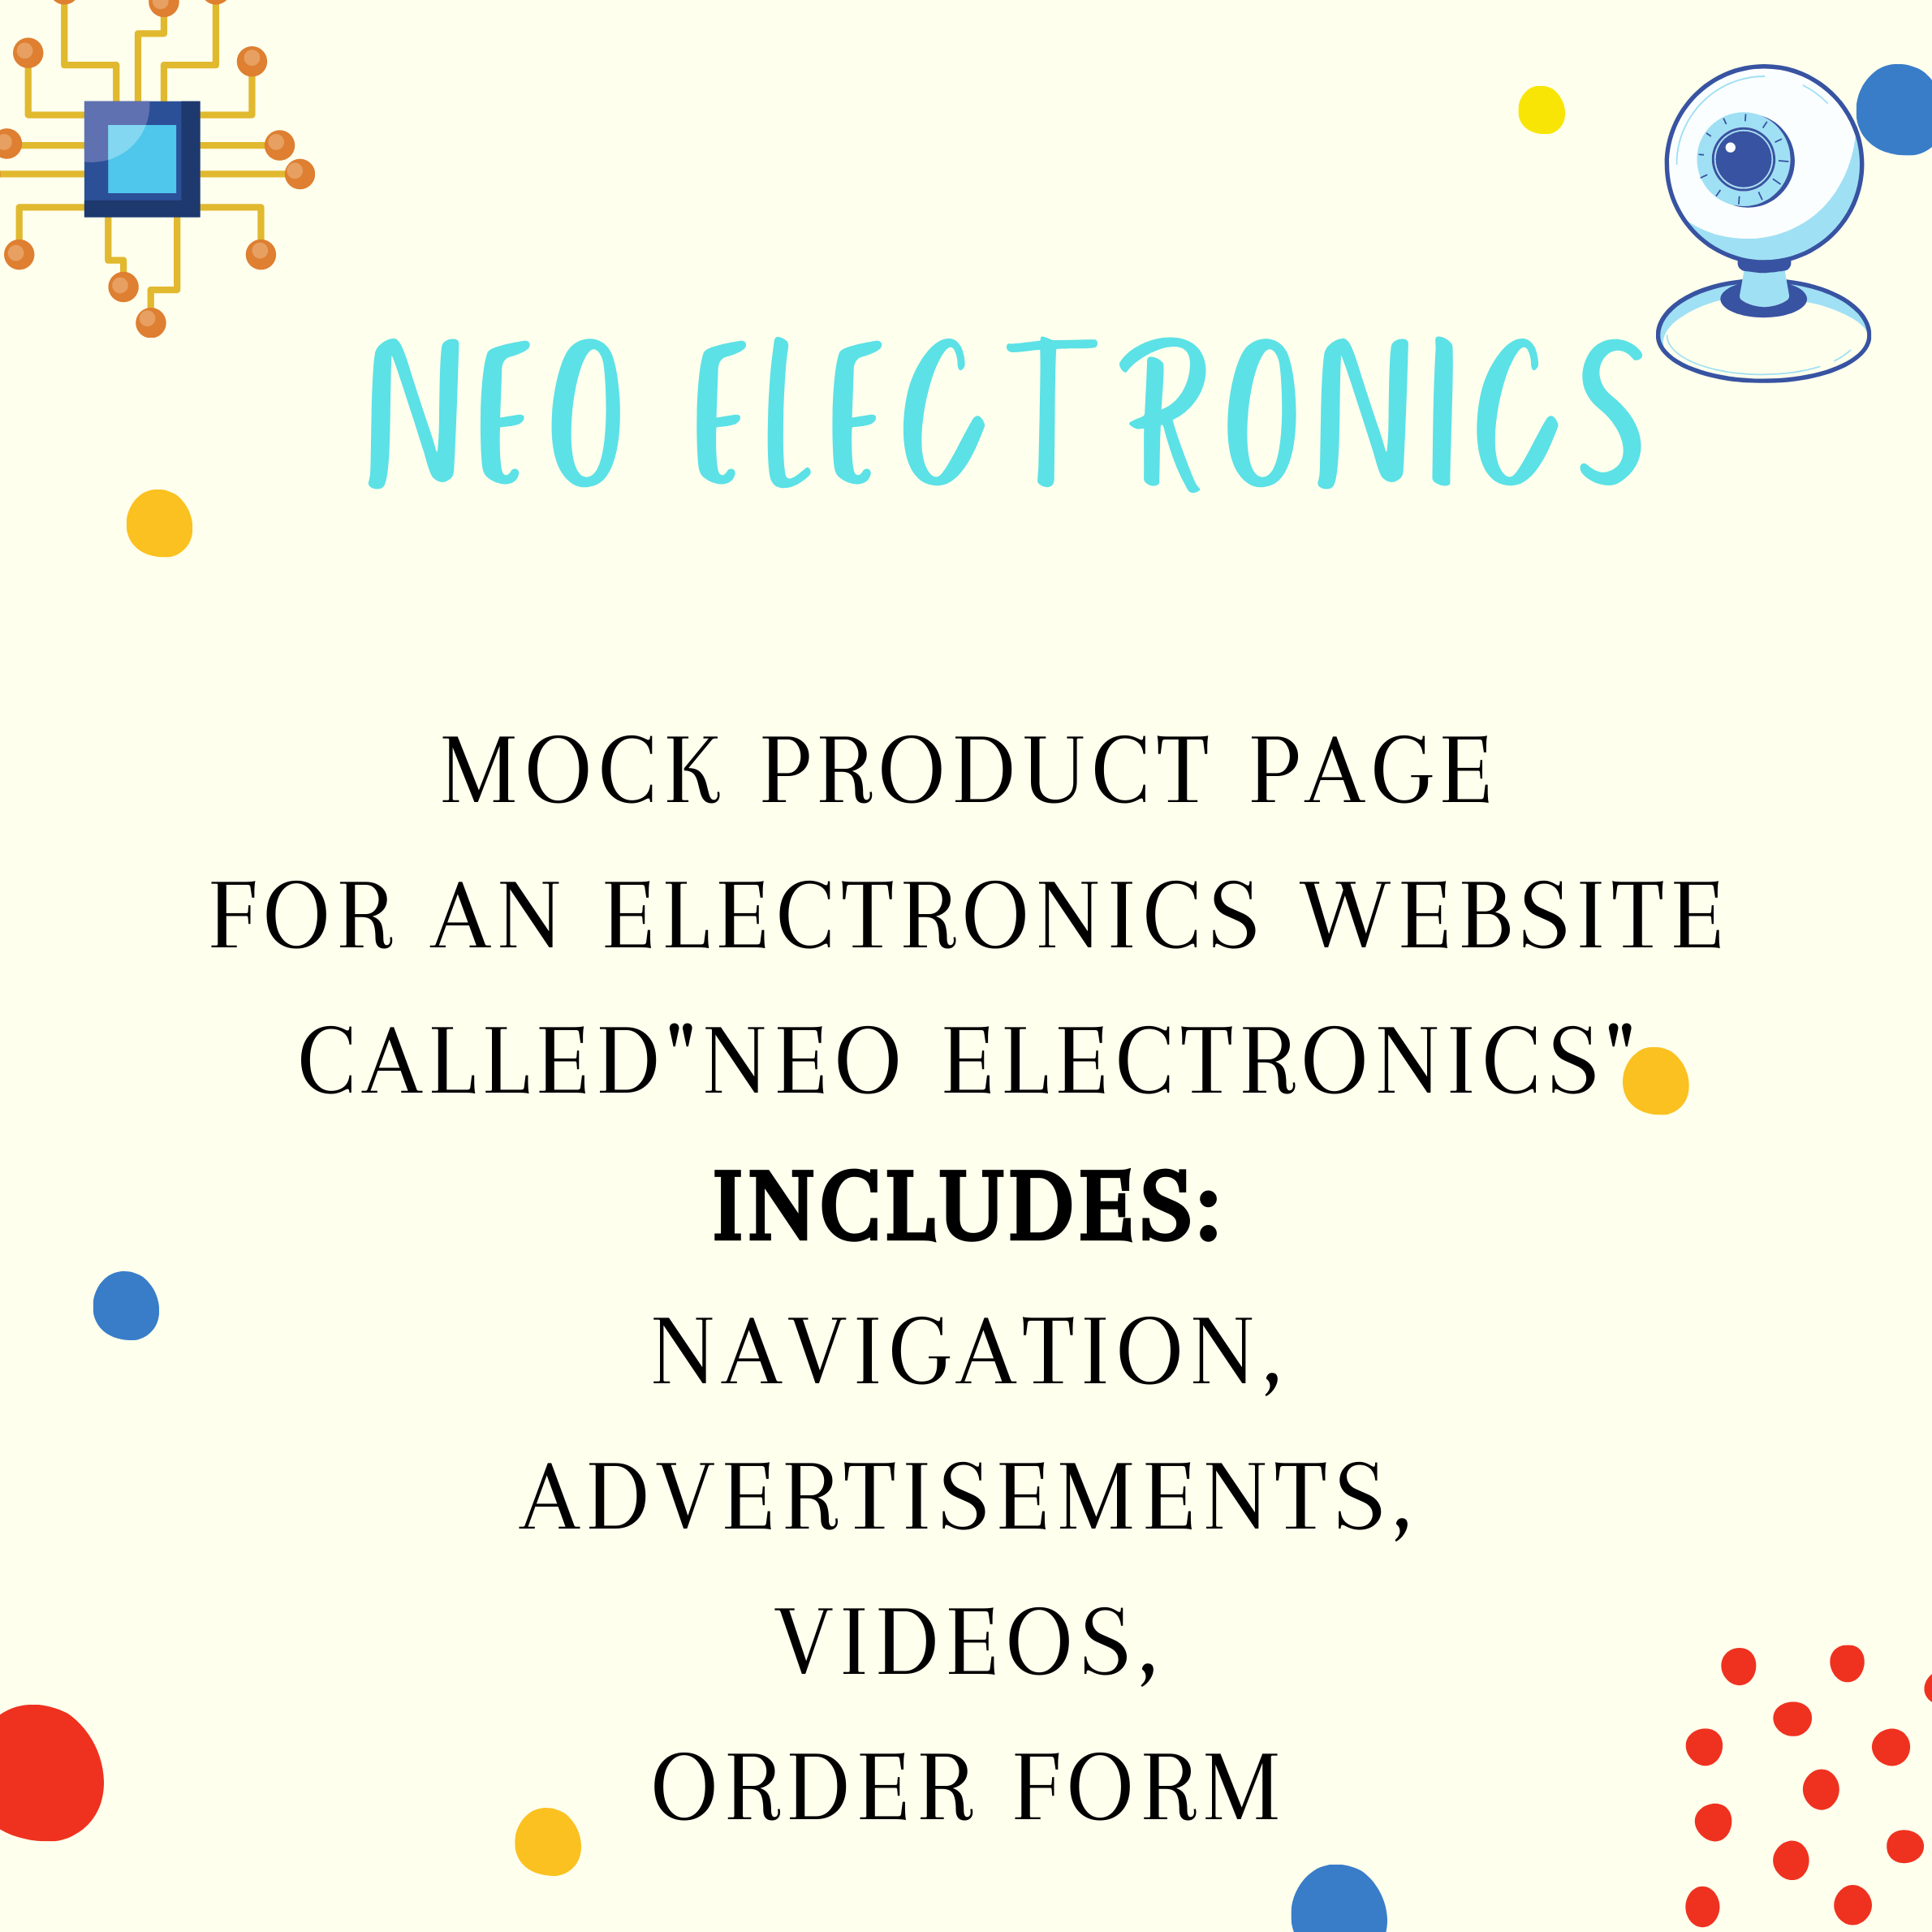 neoelectronicsdescription